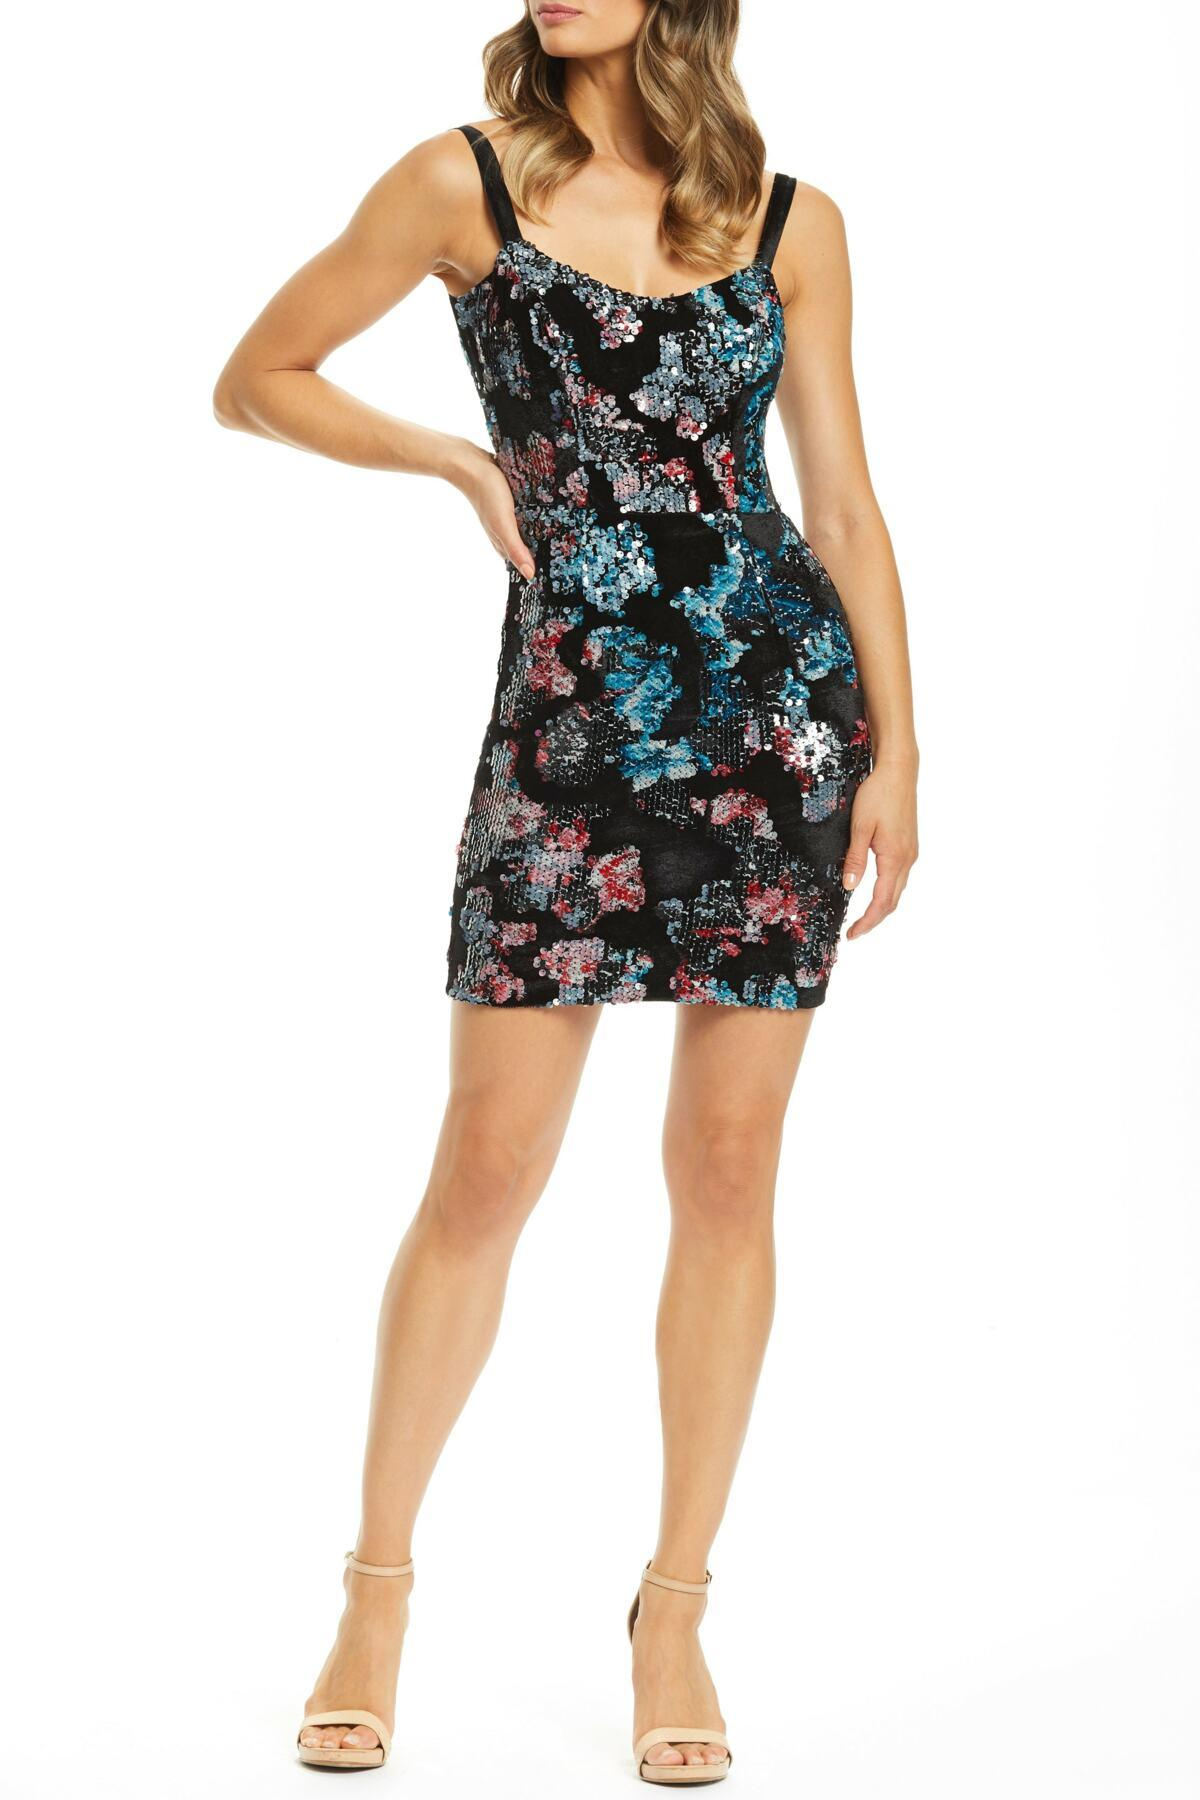 ac3ff56d9e71 Lyst - Dress the Population Lindsay Demi Neckline Sheath (nordstrom ...